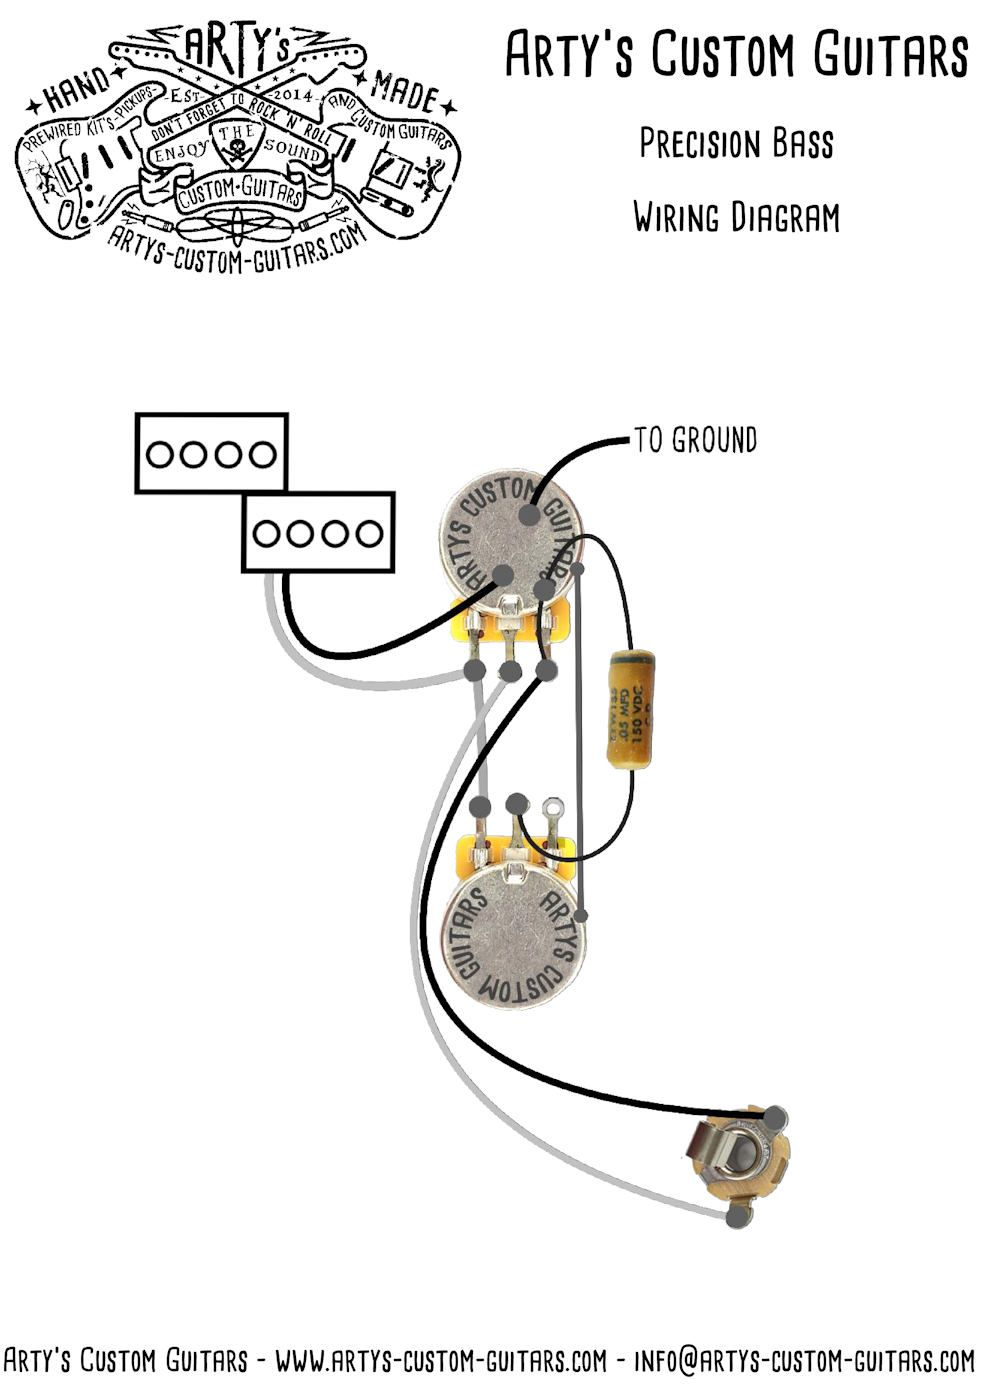 medium resolution of precision bass wiring diagram arty s custom guitars